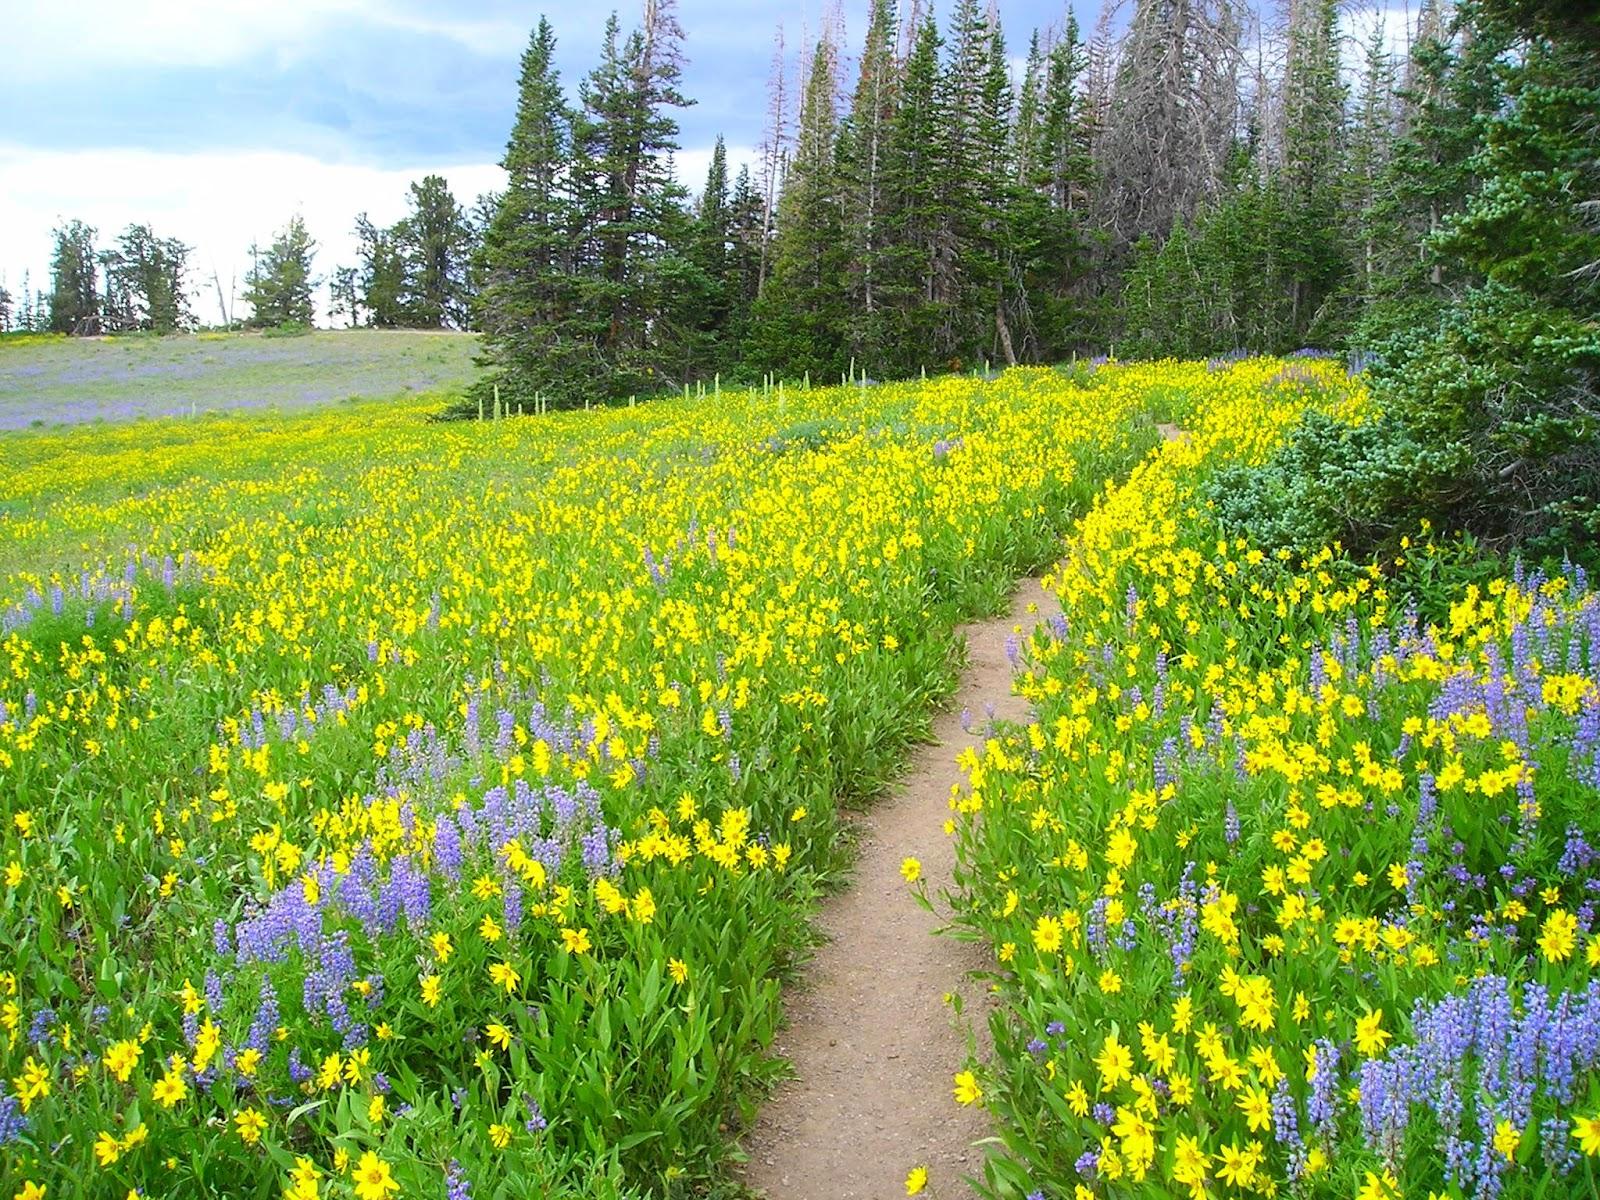 http://2.bp.blogspot.com/-fjXEqgzpK5c/T8ysrEuJMhI/AAAAAAAABlw/2tXBYxMpdKY/s1600/Alpine-Pond-upper-flowers.jpg